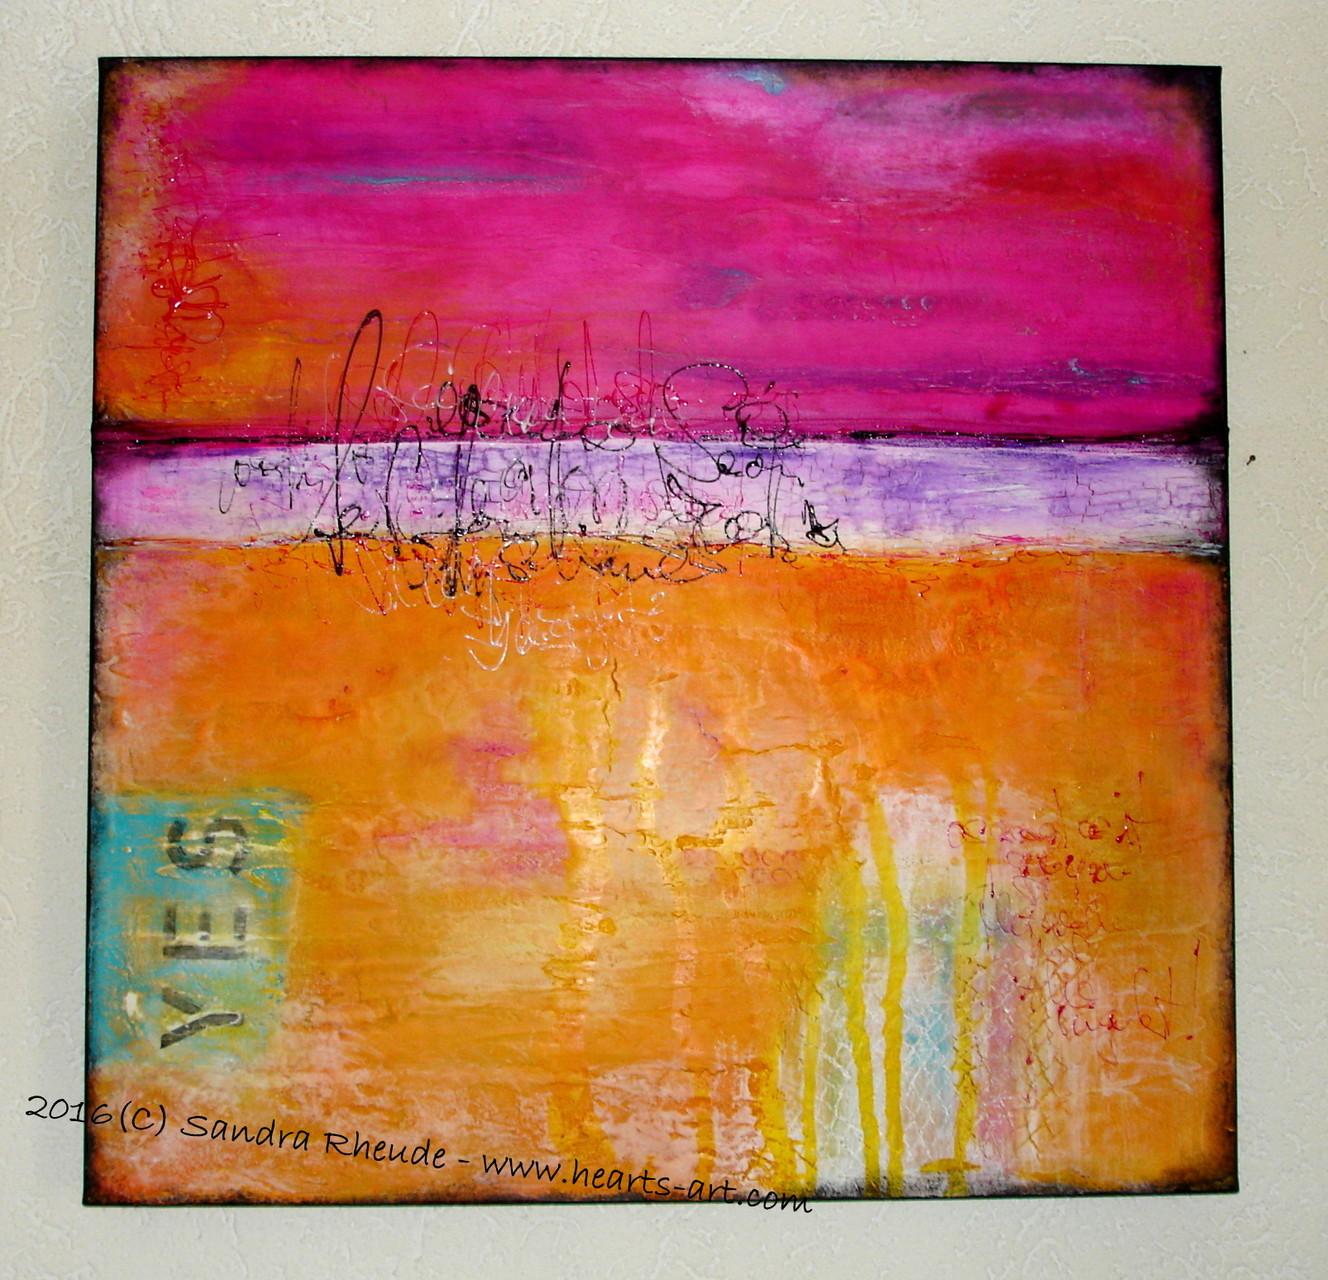 'Walkin' on Sunshine' -  2016/15 - Acryl/MixedMedia auf Leinwand - 70 x 70 x 4,5 cm - verkauft (Schweiz)